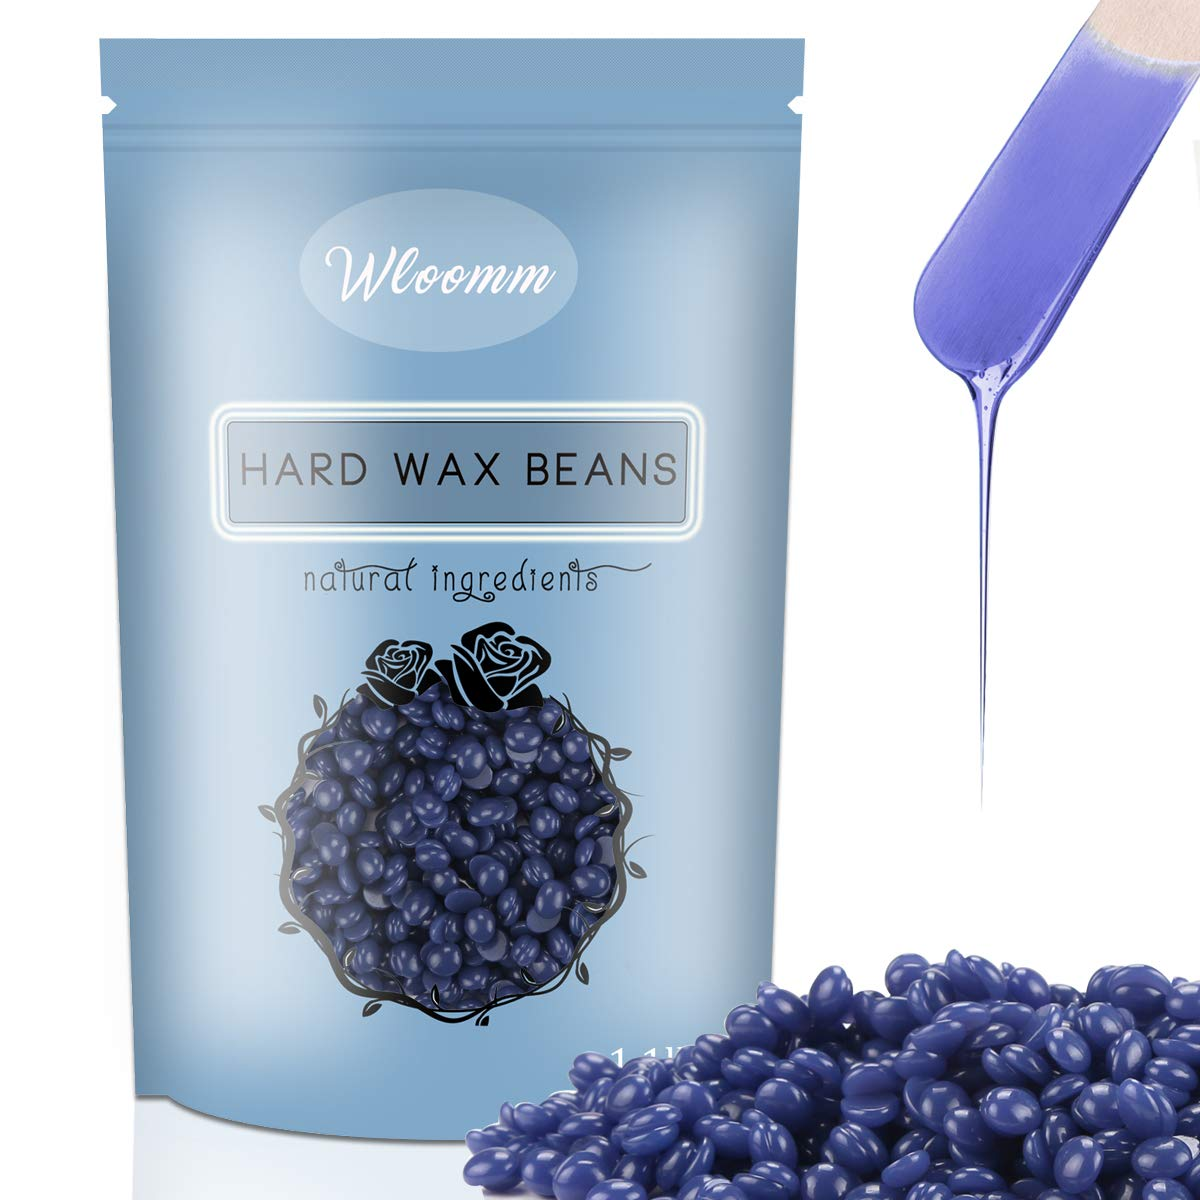 Wax Beans Wloomm Hard Wax Beans for Painless Hair Removal, Brazilian Bikini  Waxing Beads for